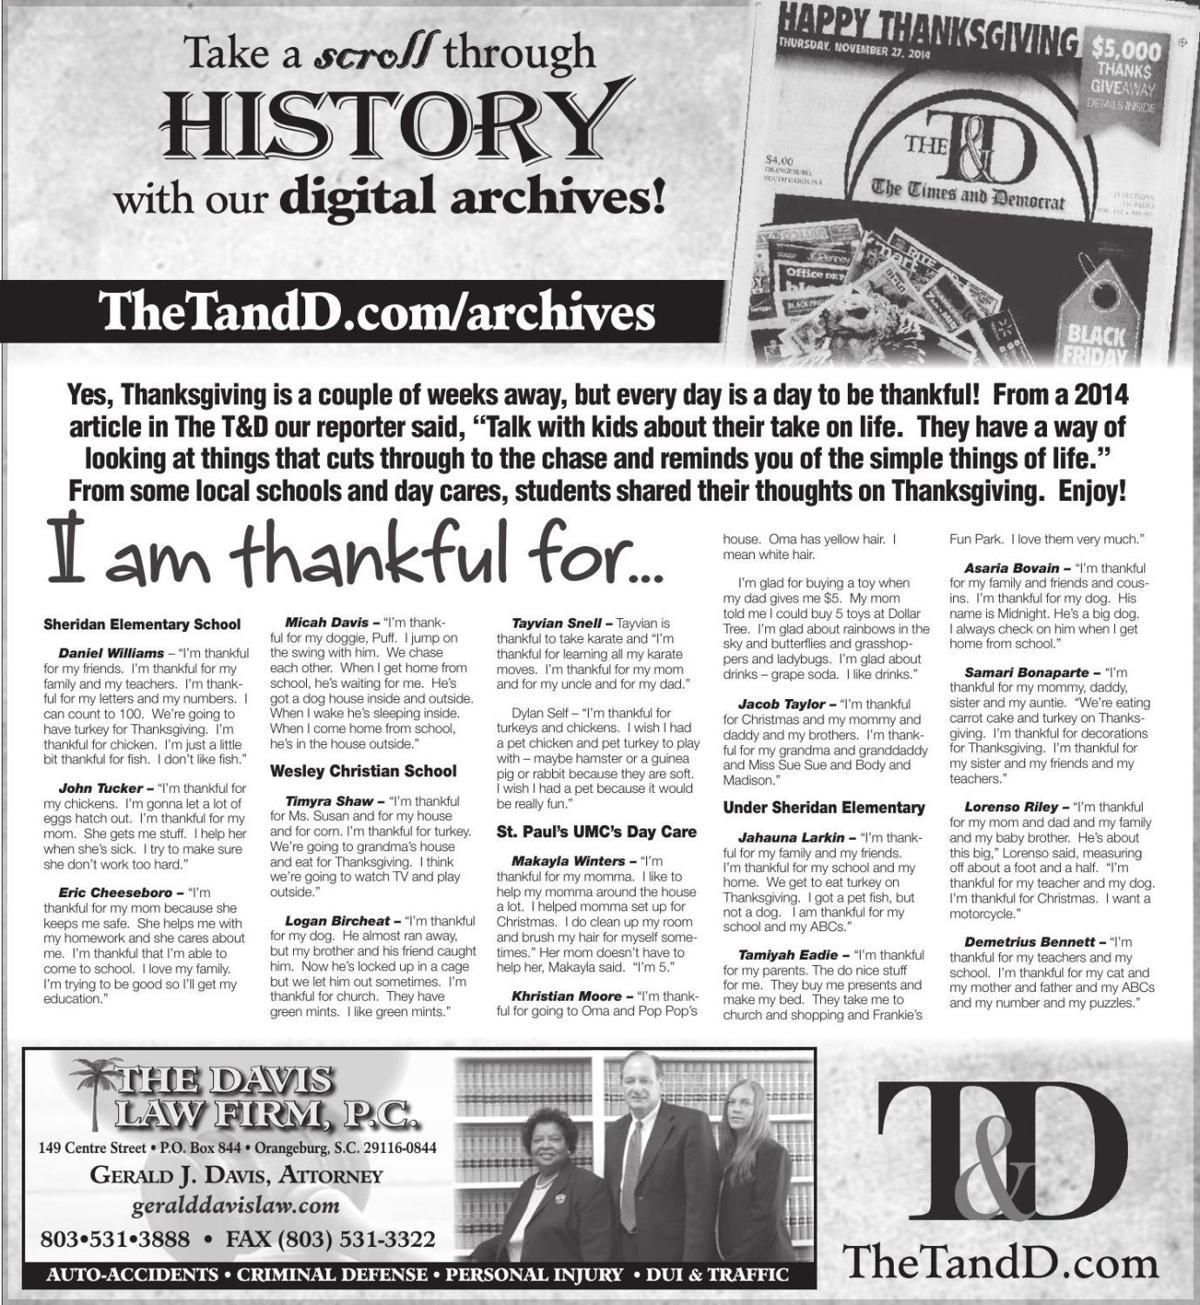 TheTandD.com/archives Nov. 17, 2019